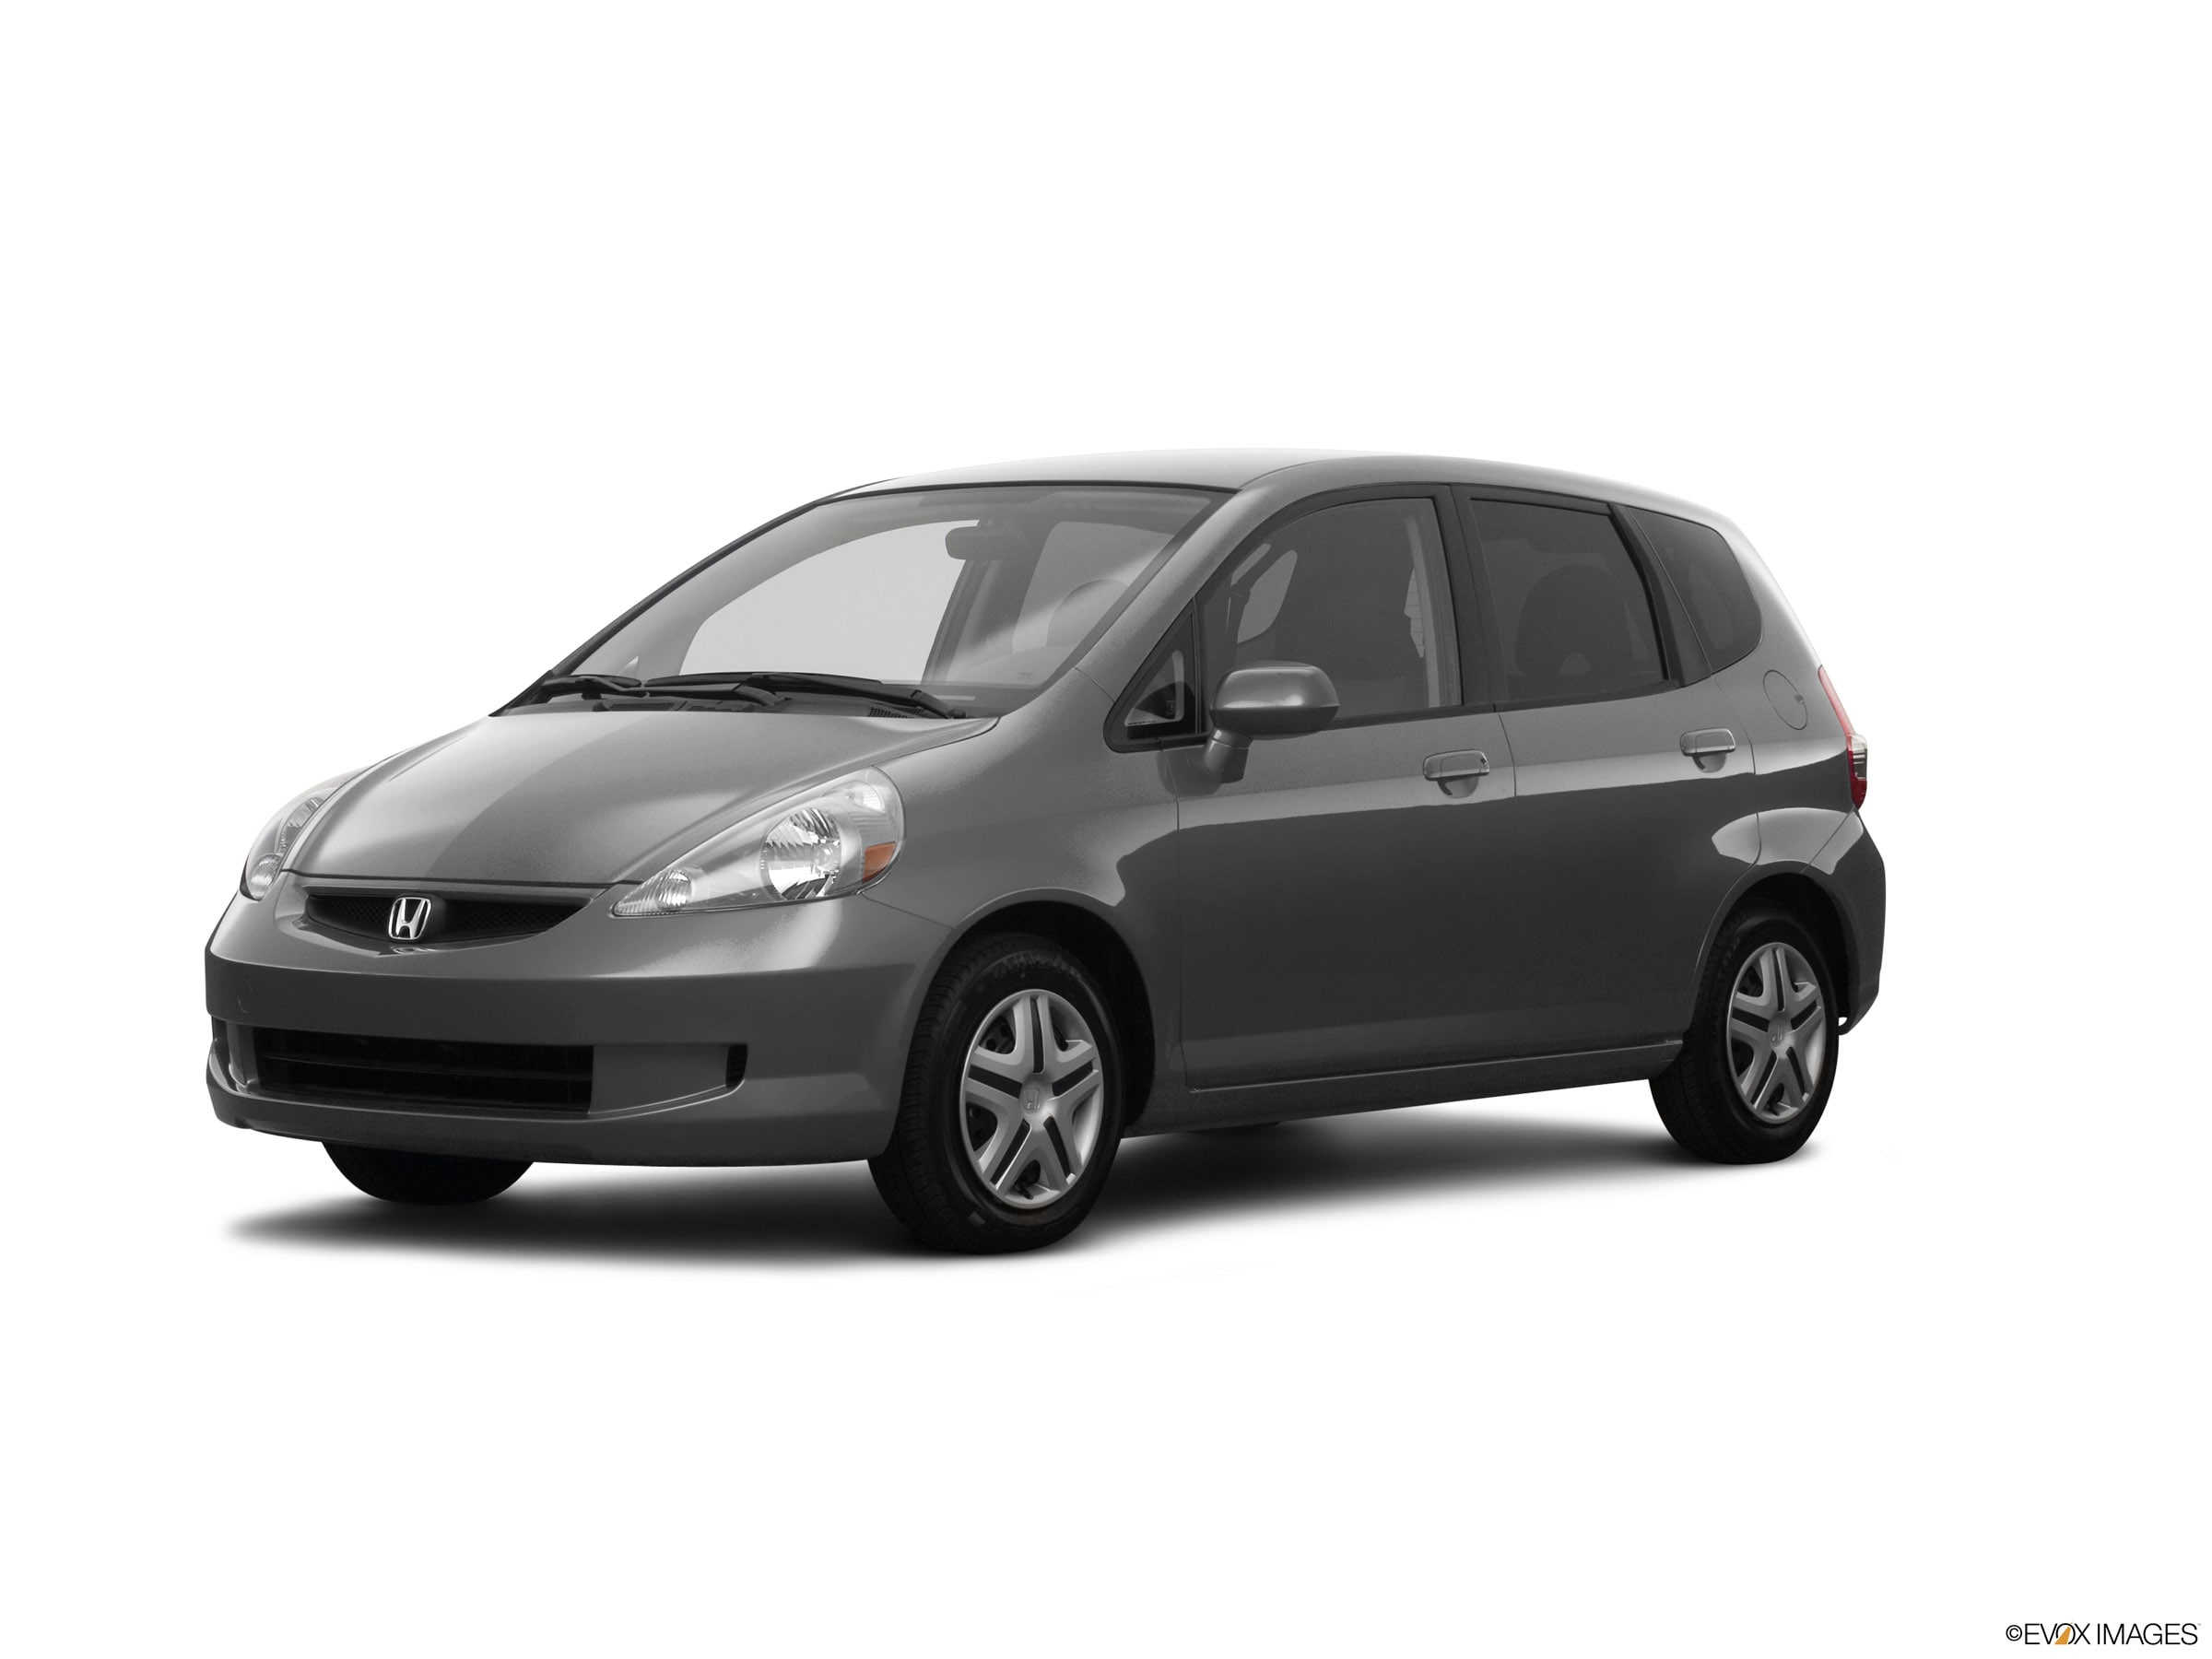 2008 Honda Fit Base Hatchback I4 16V MPFI SOHC